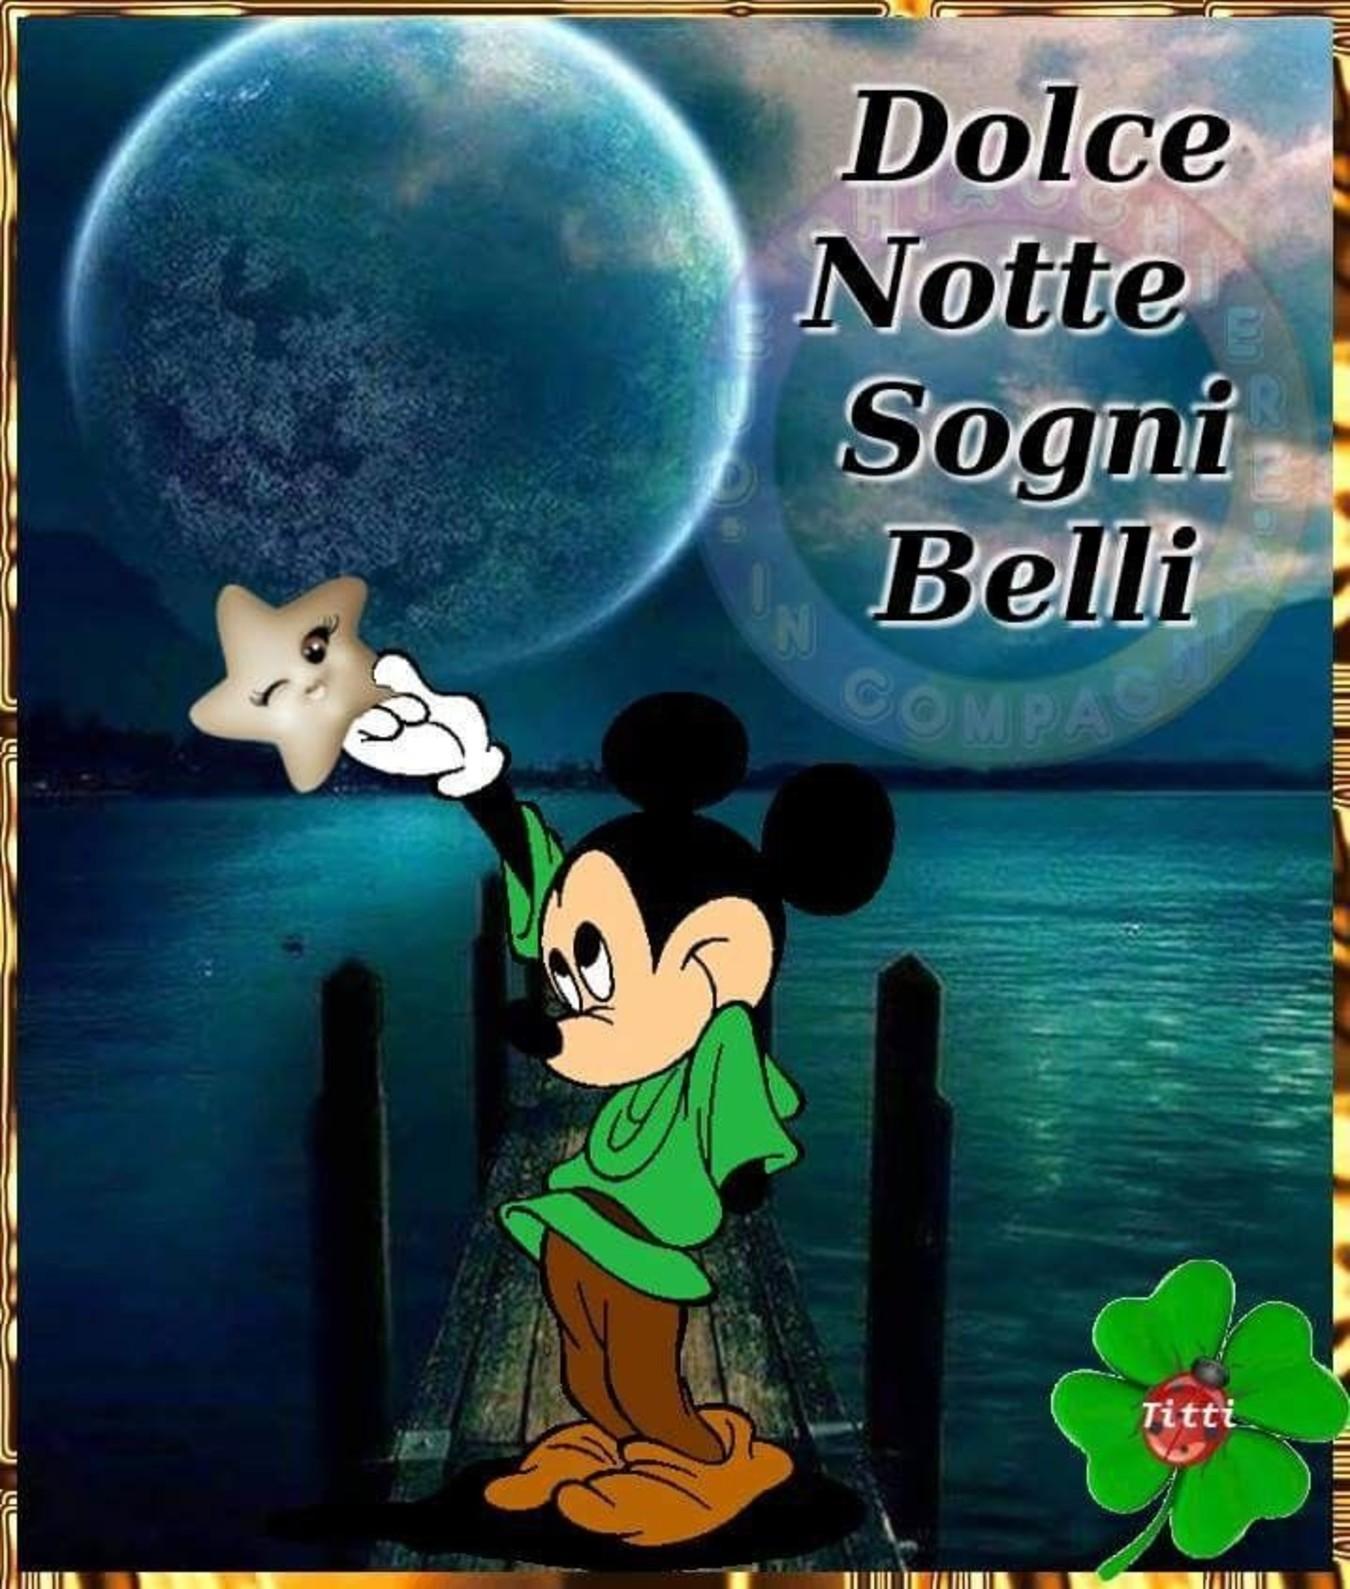 Immagini Buonanotte Belle Gratis Per Whatsapp 622 Immaginifacebook It